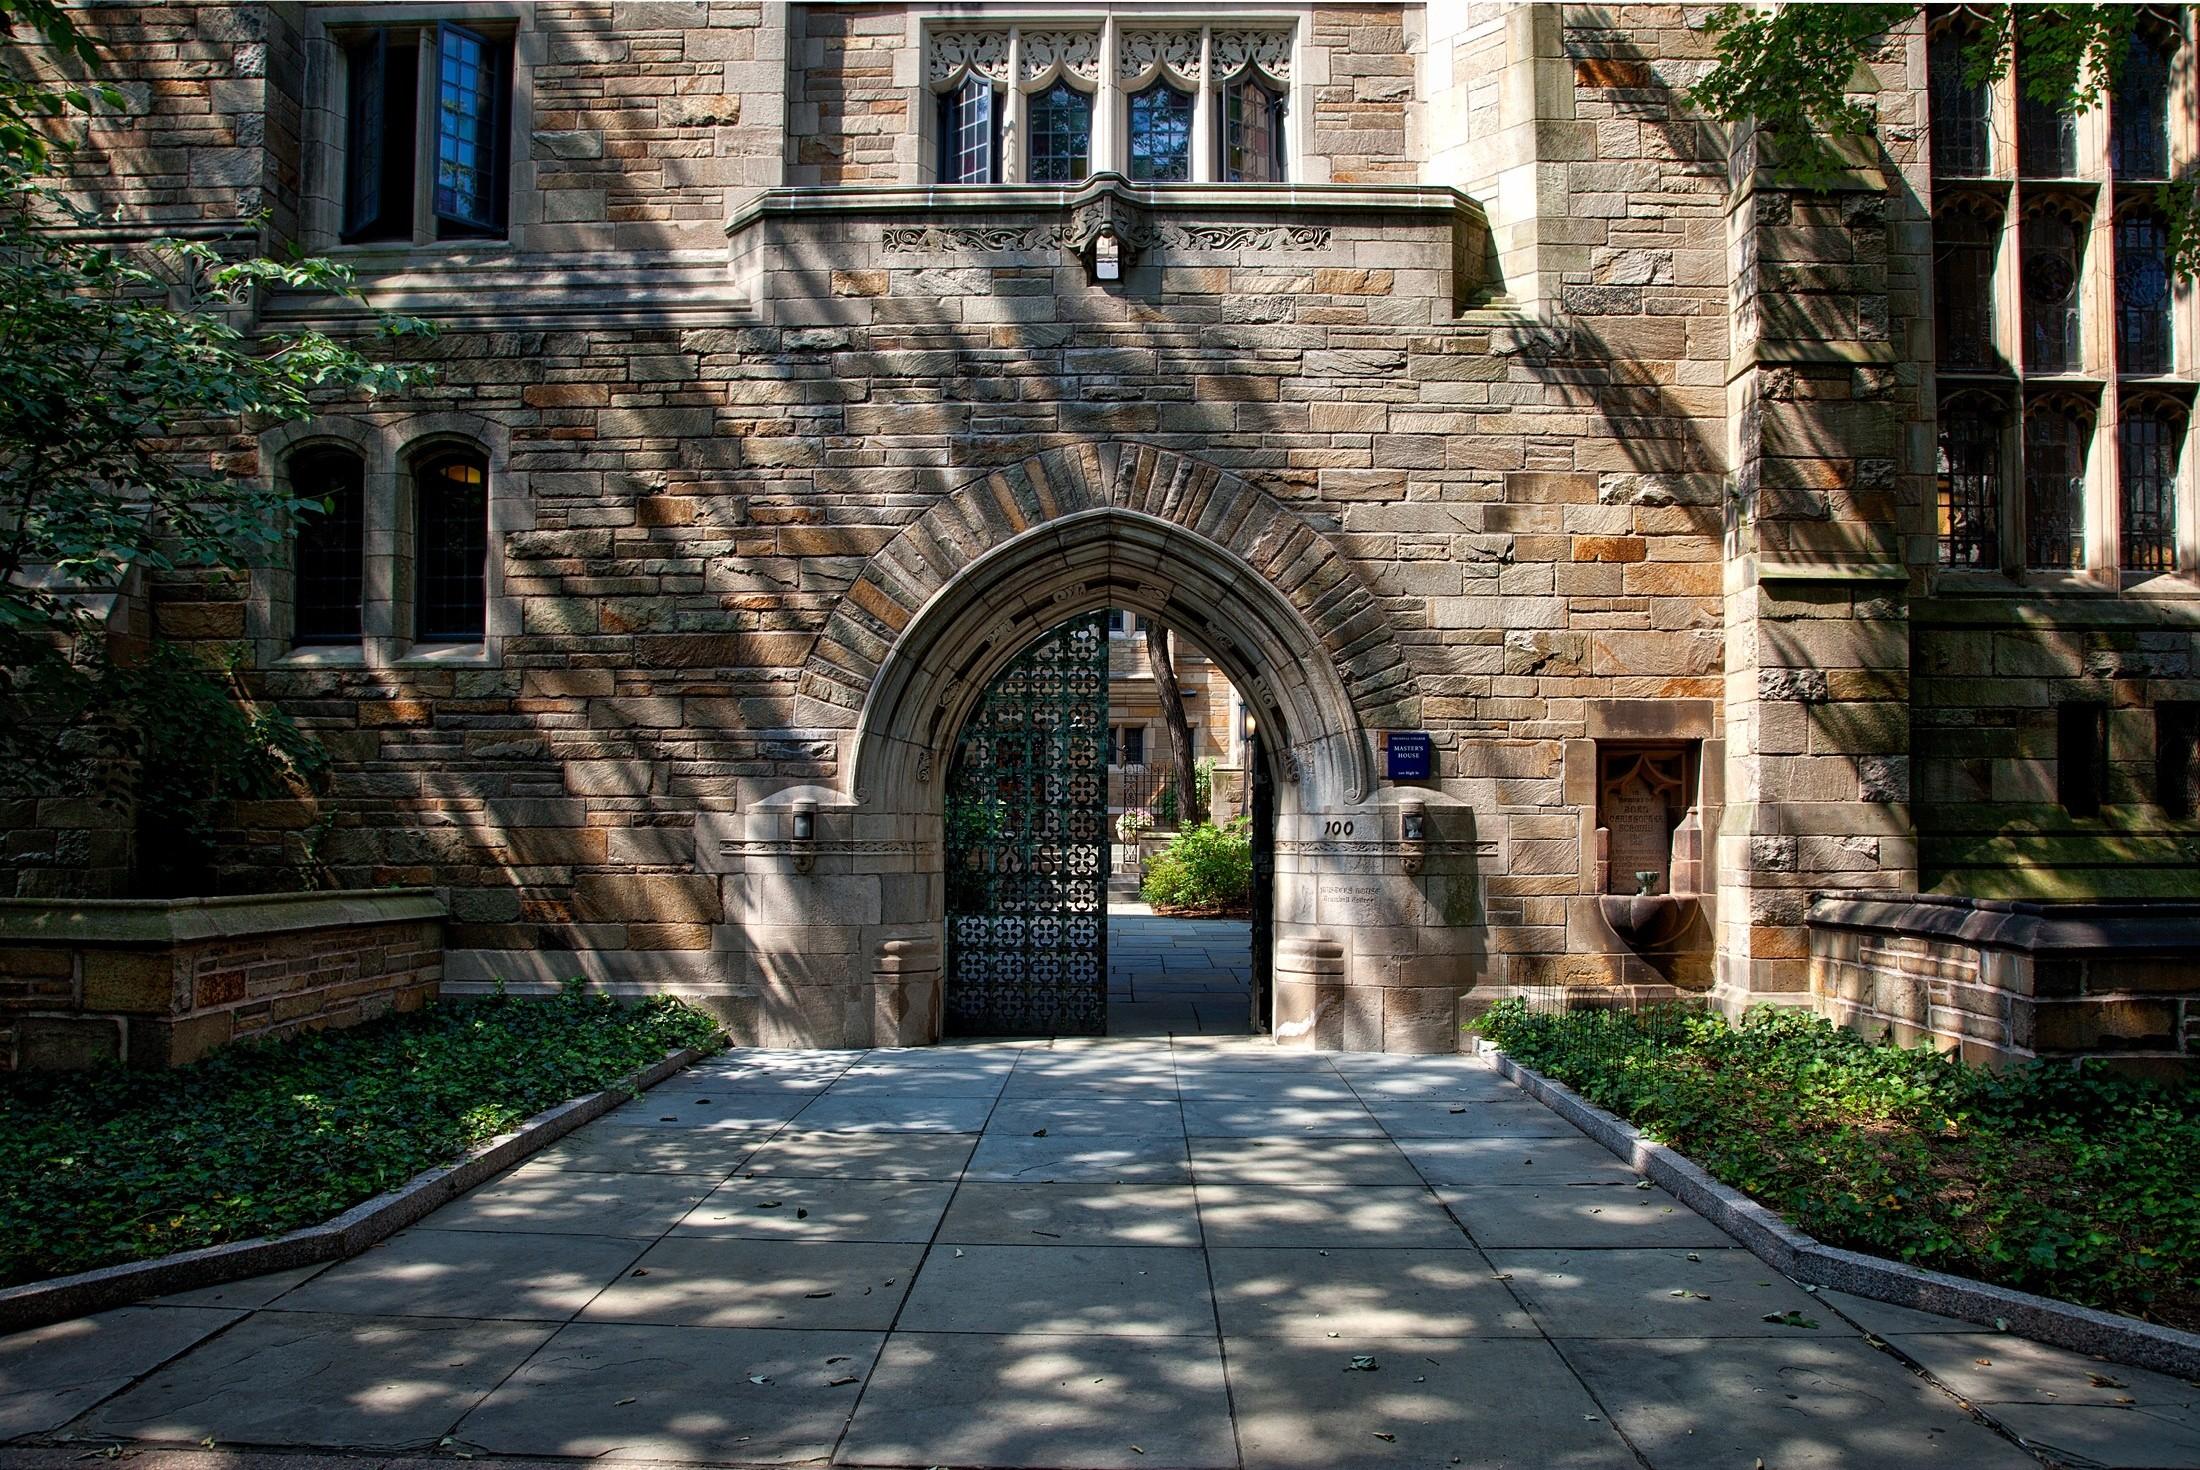 … wallpaper ancient arch architecture brick brick wall buildings campus  city colleges entrance famous garden historic house landmark …